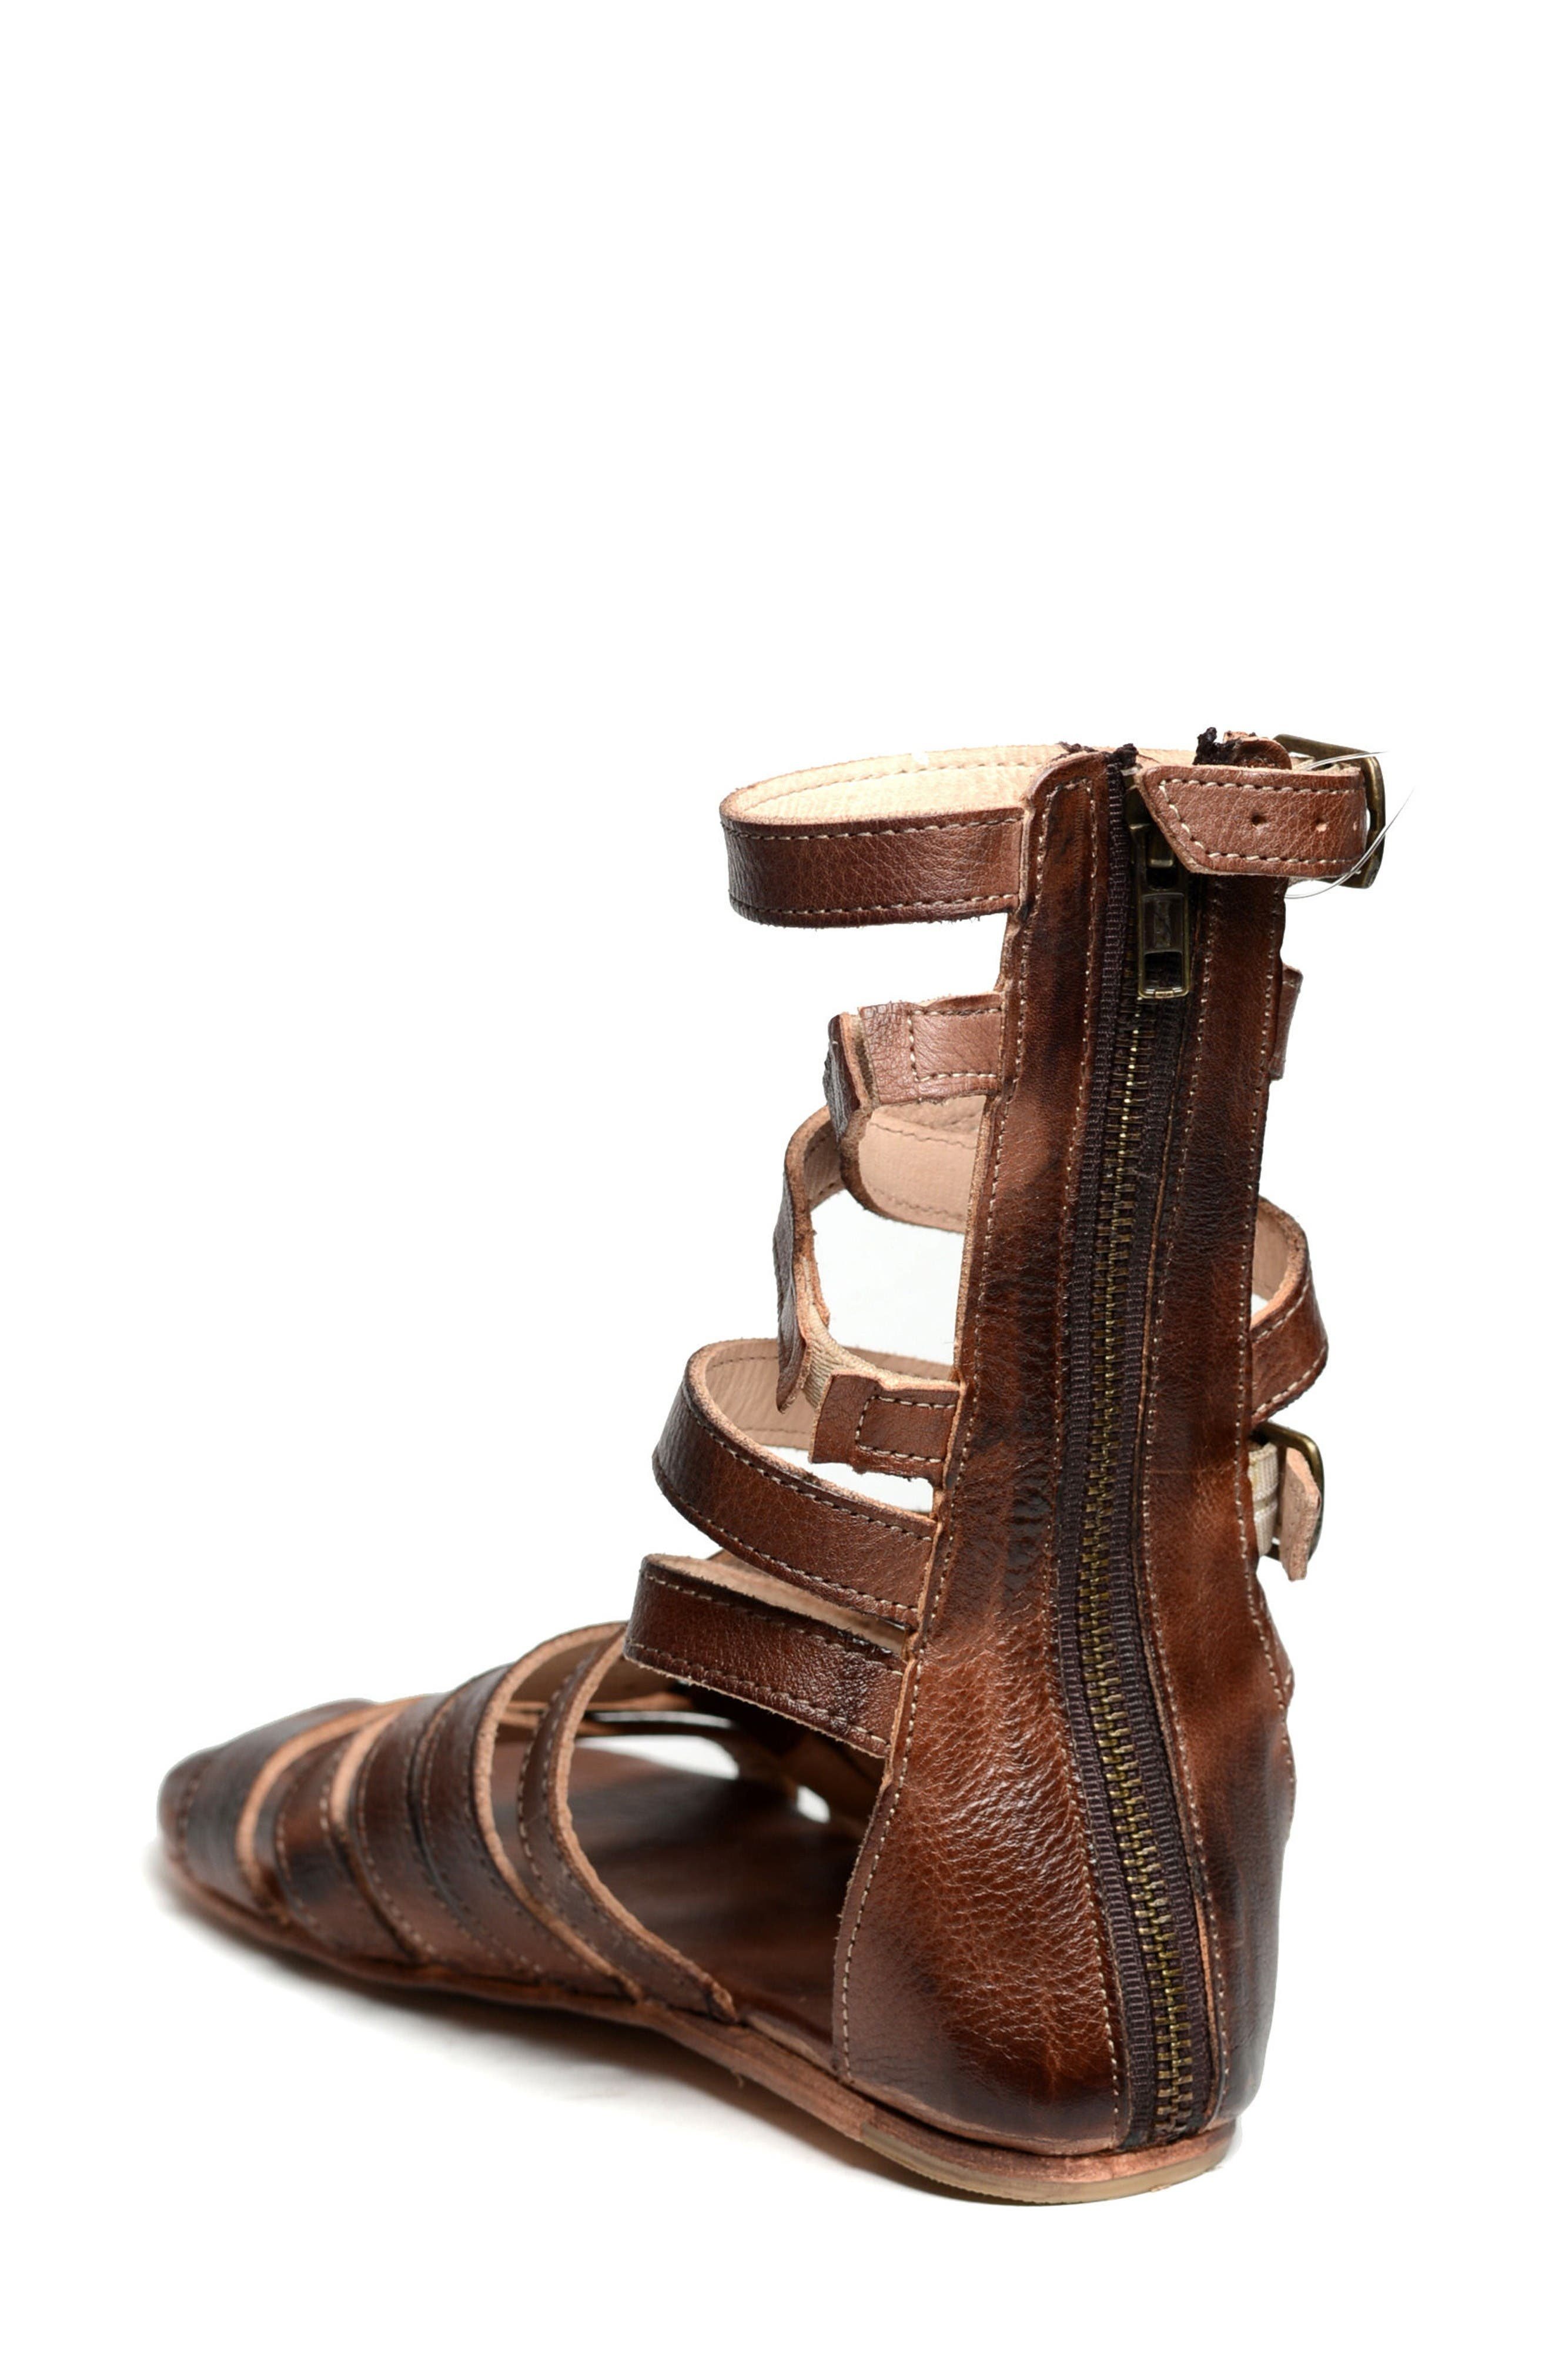 Bed Stu Shoes